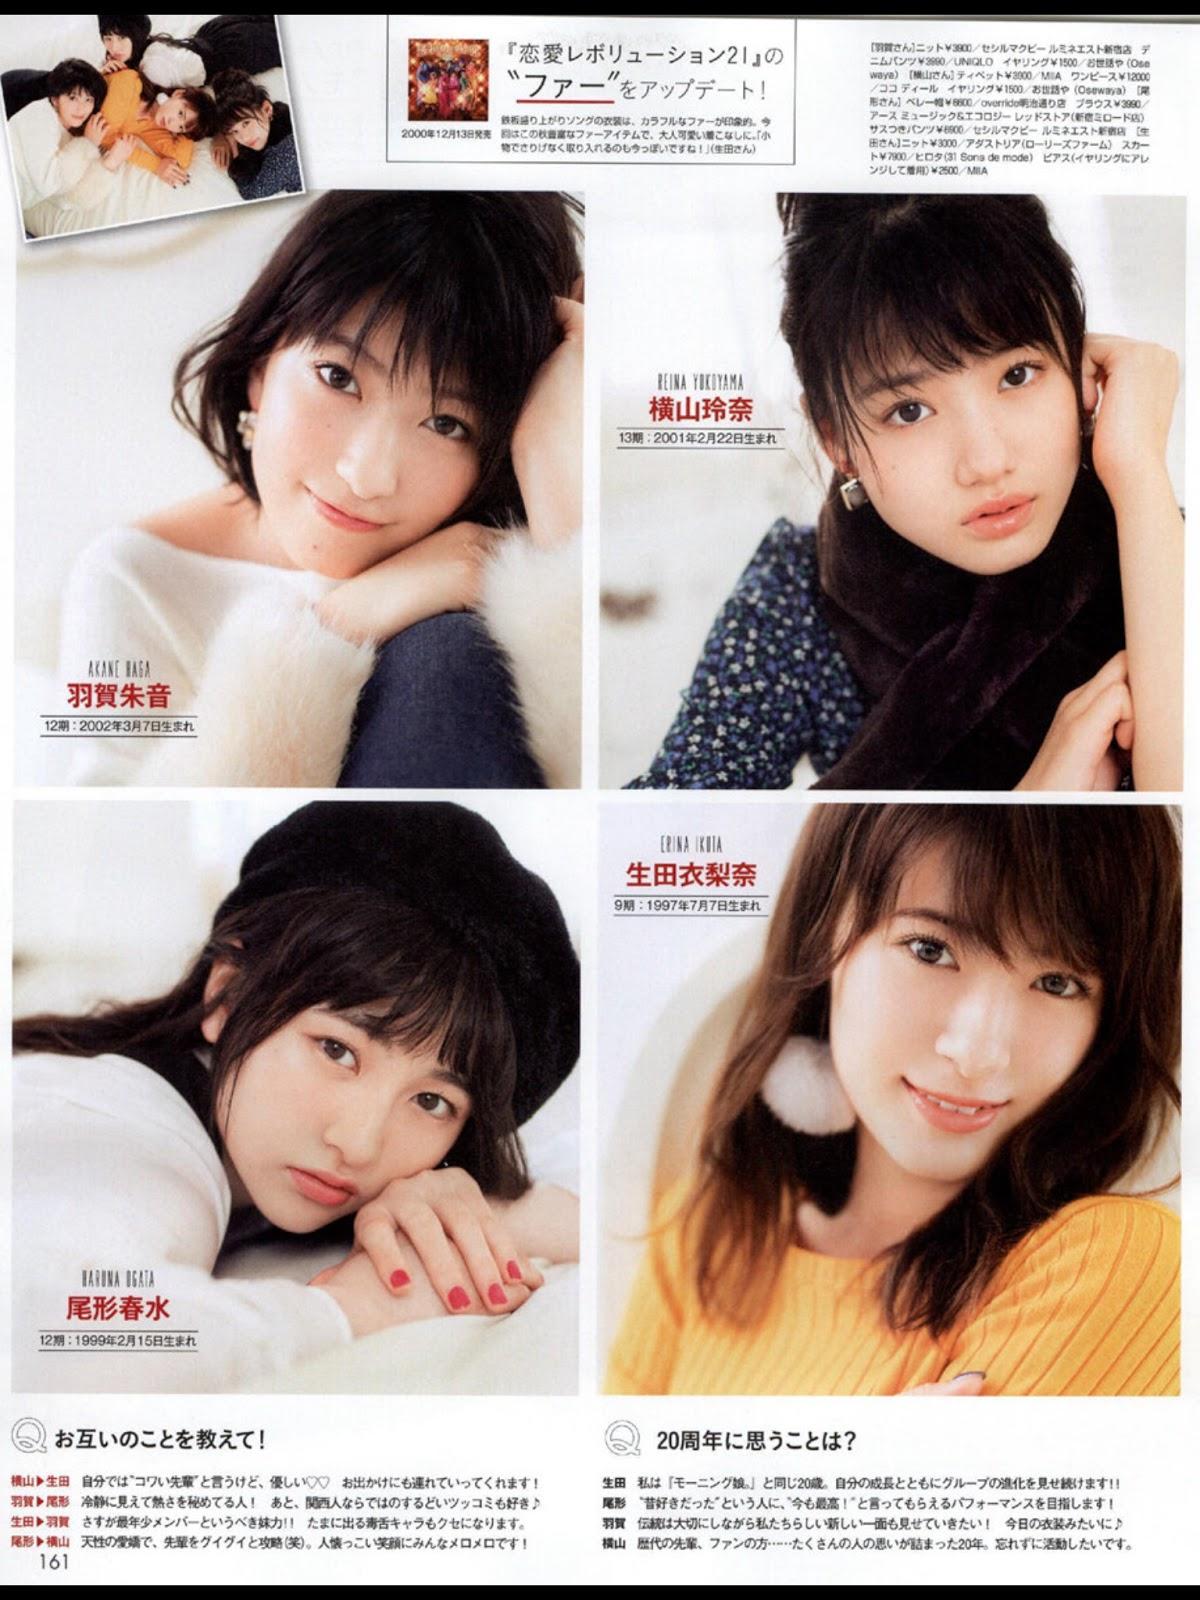 kanzaki single personals Kanzaki maki from generasia jump to: navigation, search  [19960401] see you again / the best of maki kanzaki singles [19920311] arbeit days.